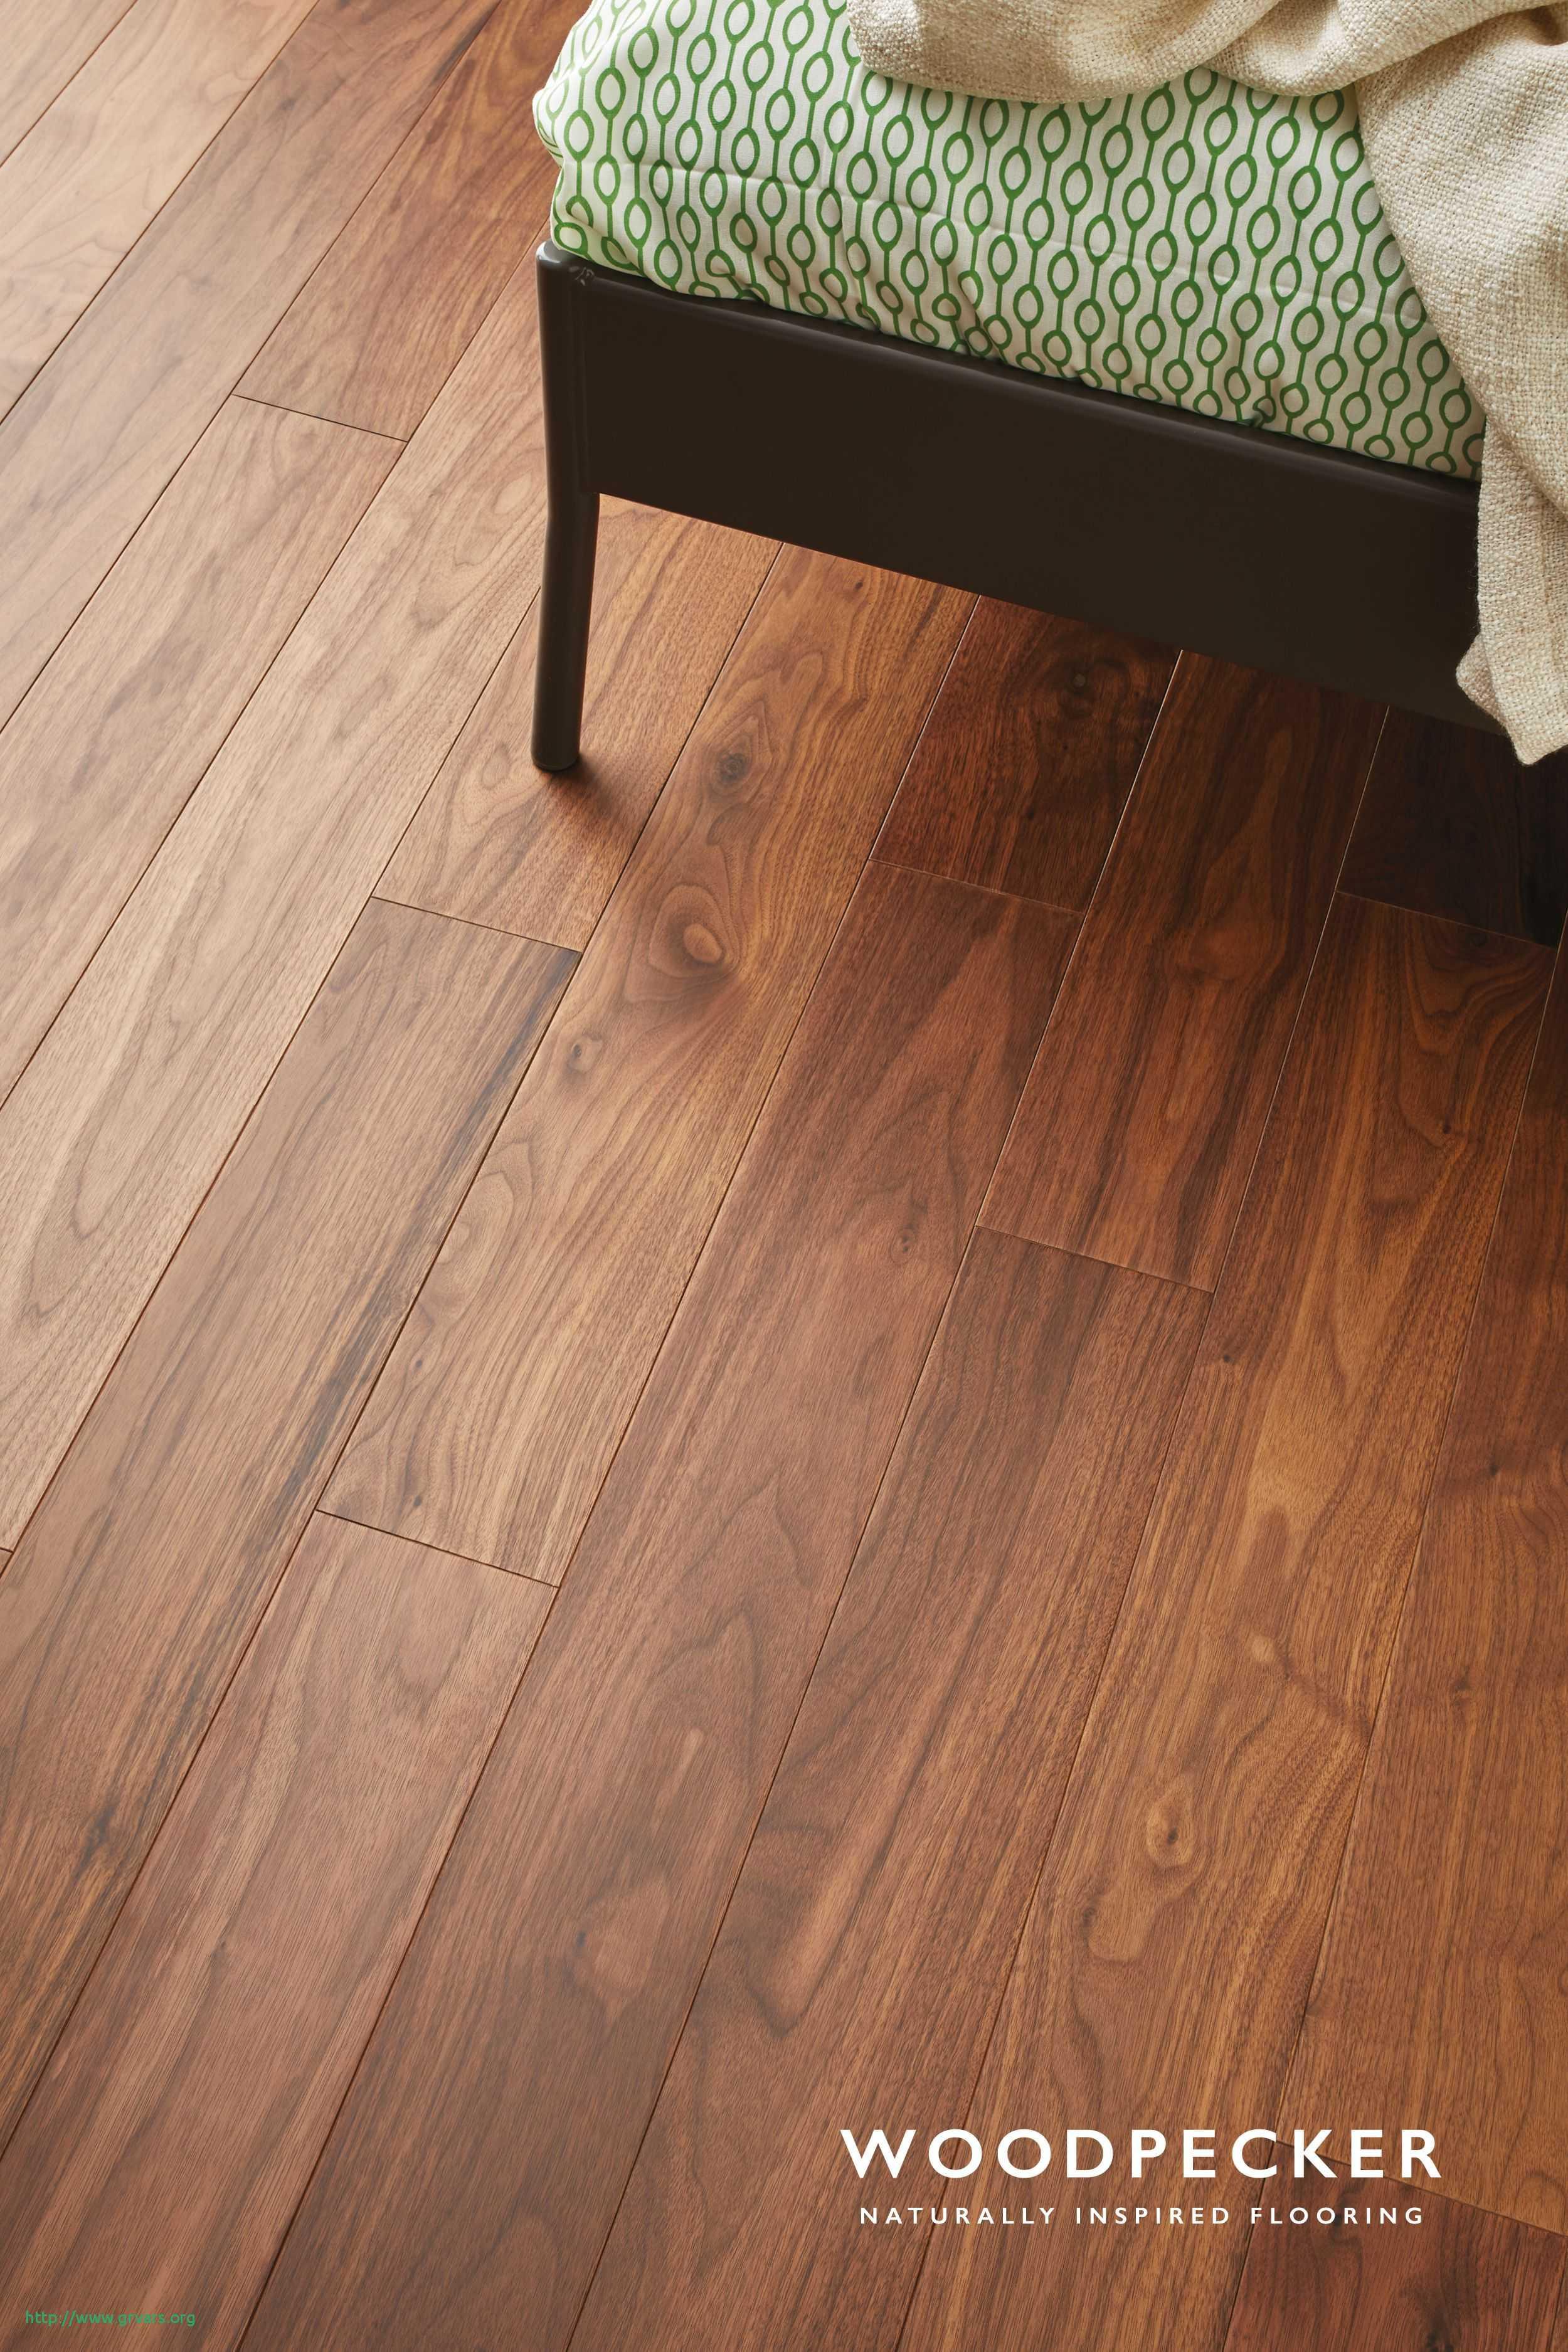 hardwood flooring nails home depot of 15 luxe hardwood flooring in massachusetts ideas blog regarding 15 photos of the 15 luxe hardwood flooring in massachusetts